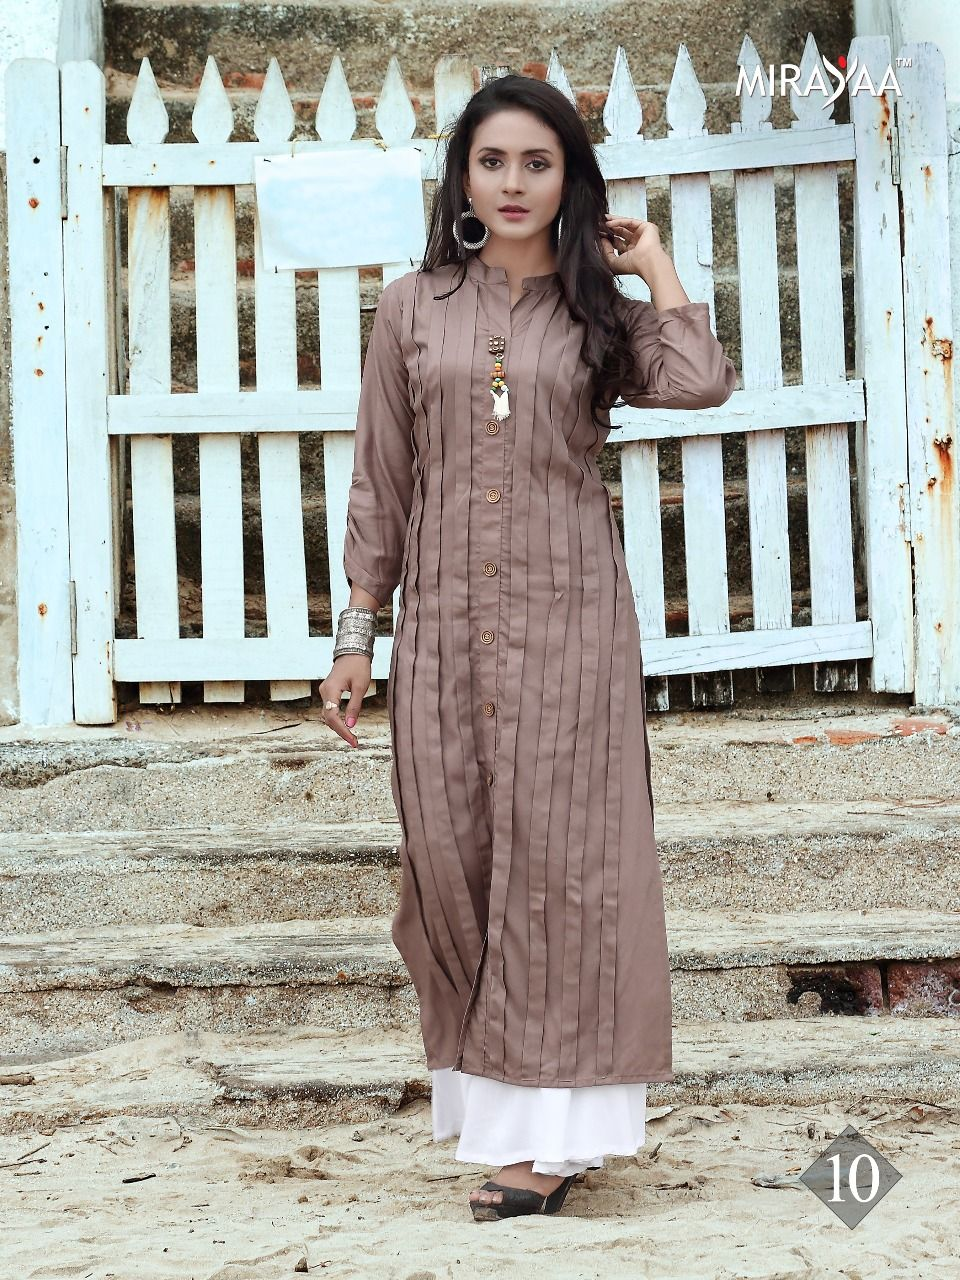 Mirayaa Bitcoin Vol 2 Rayon Stylish Kurtis Manufacturer Hijab Segitiga Buble Georgete Indianclothstore Georgette Anarkalisuit Pantstylesuit